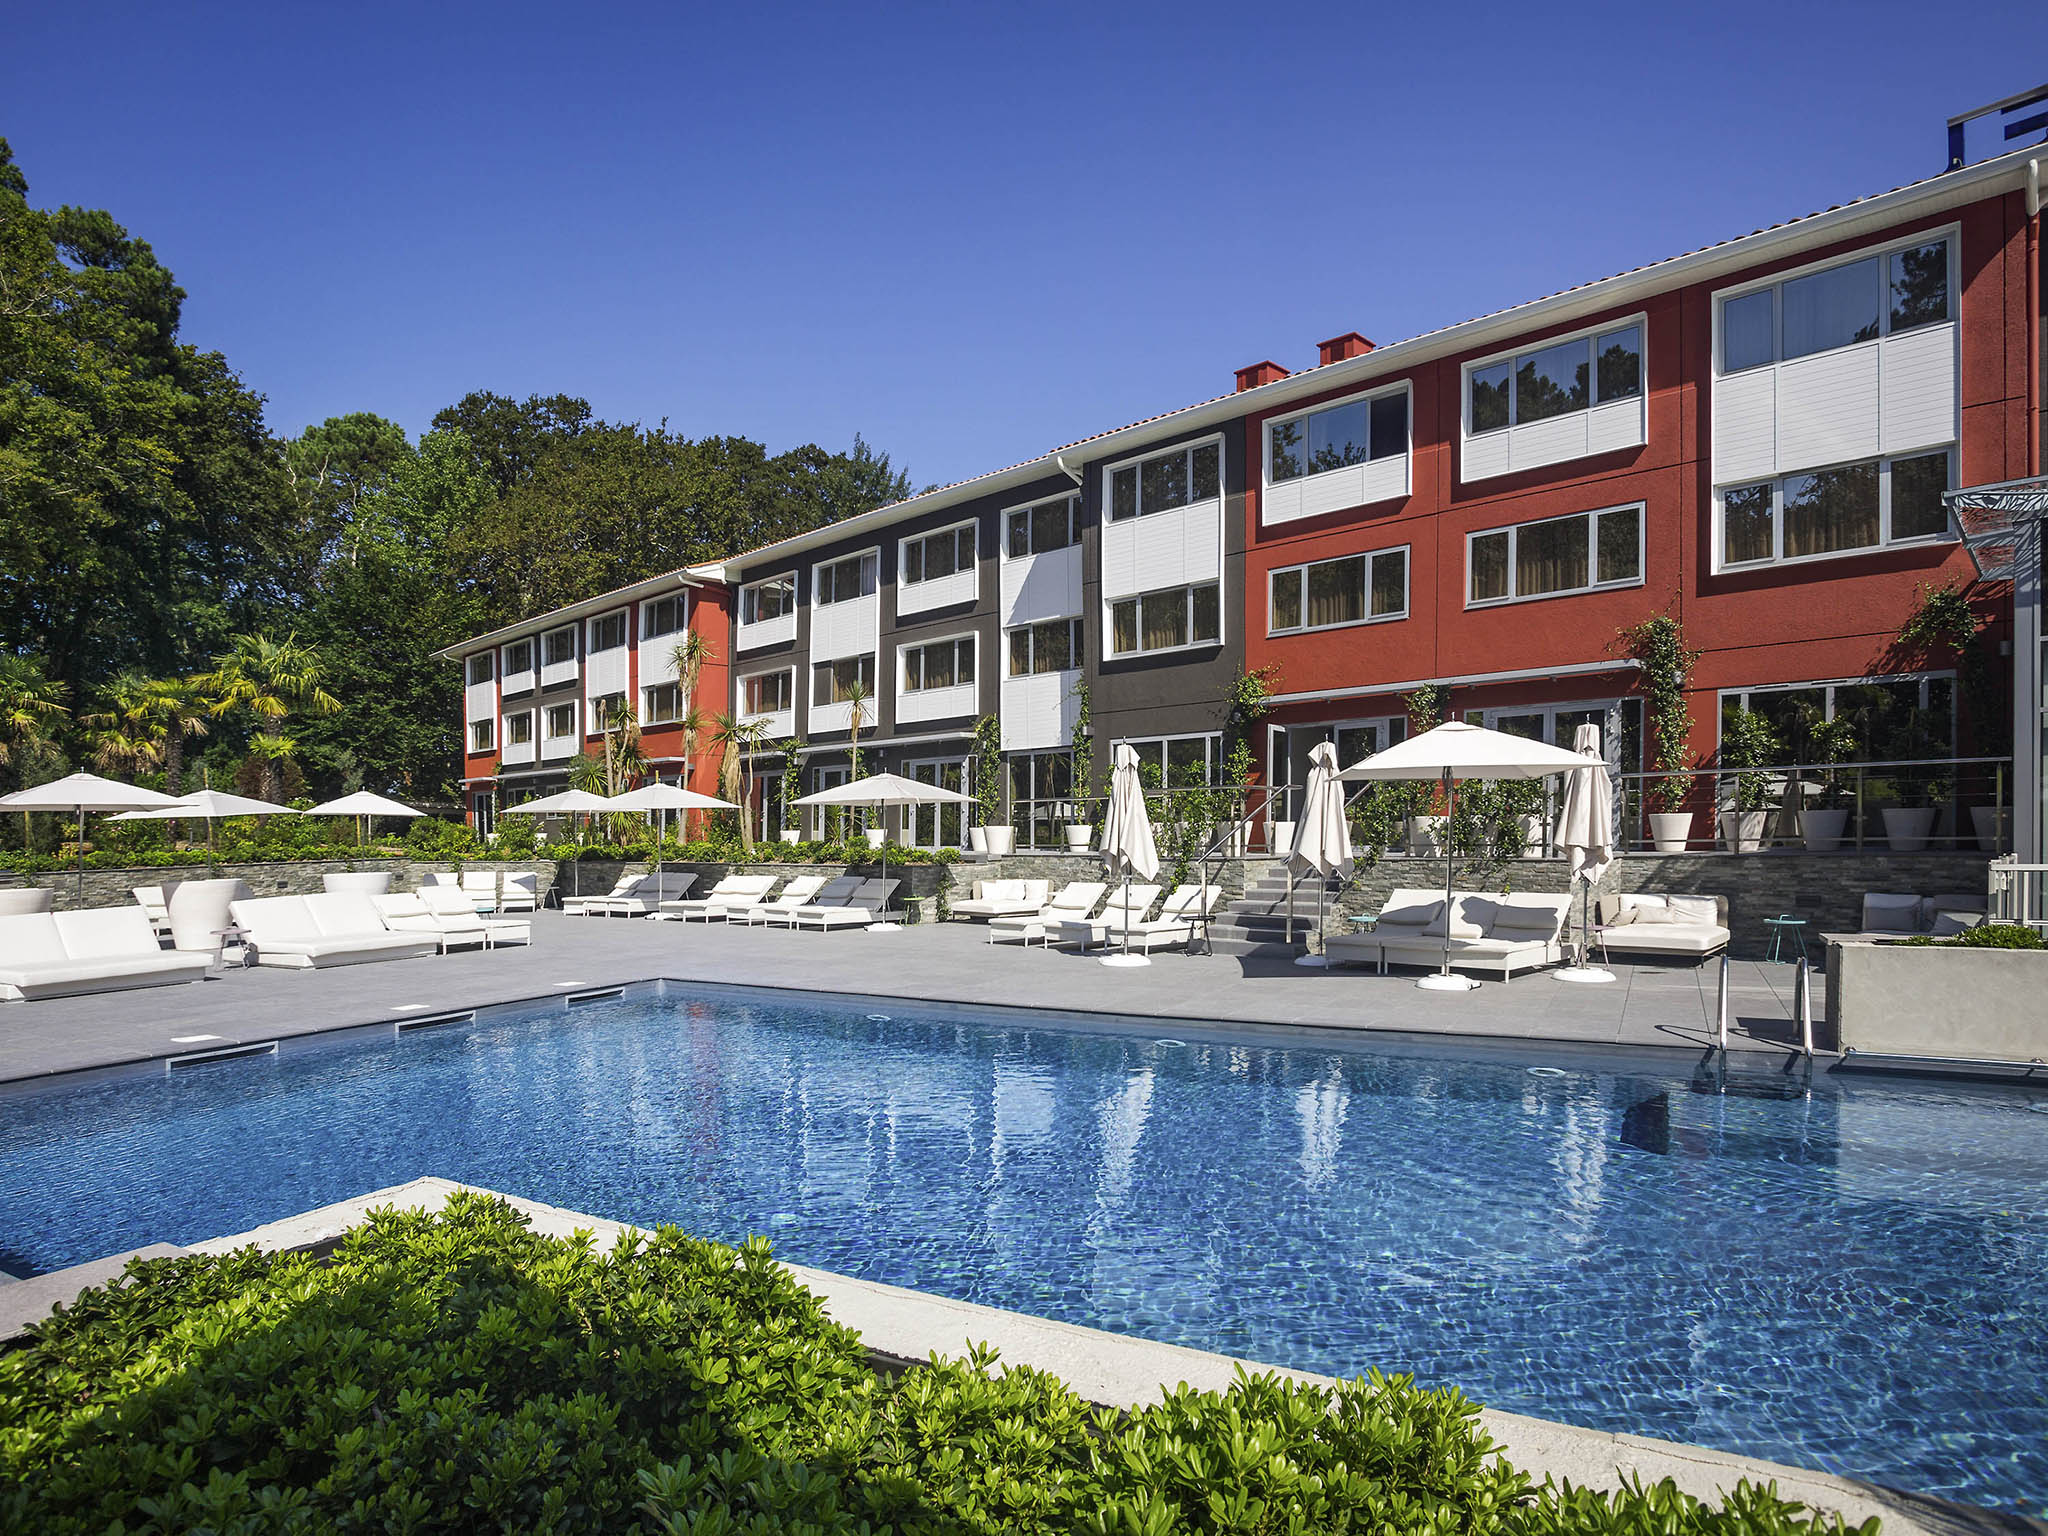 Hôtel - Novotel Resort & Spa Biarritz Anglet